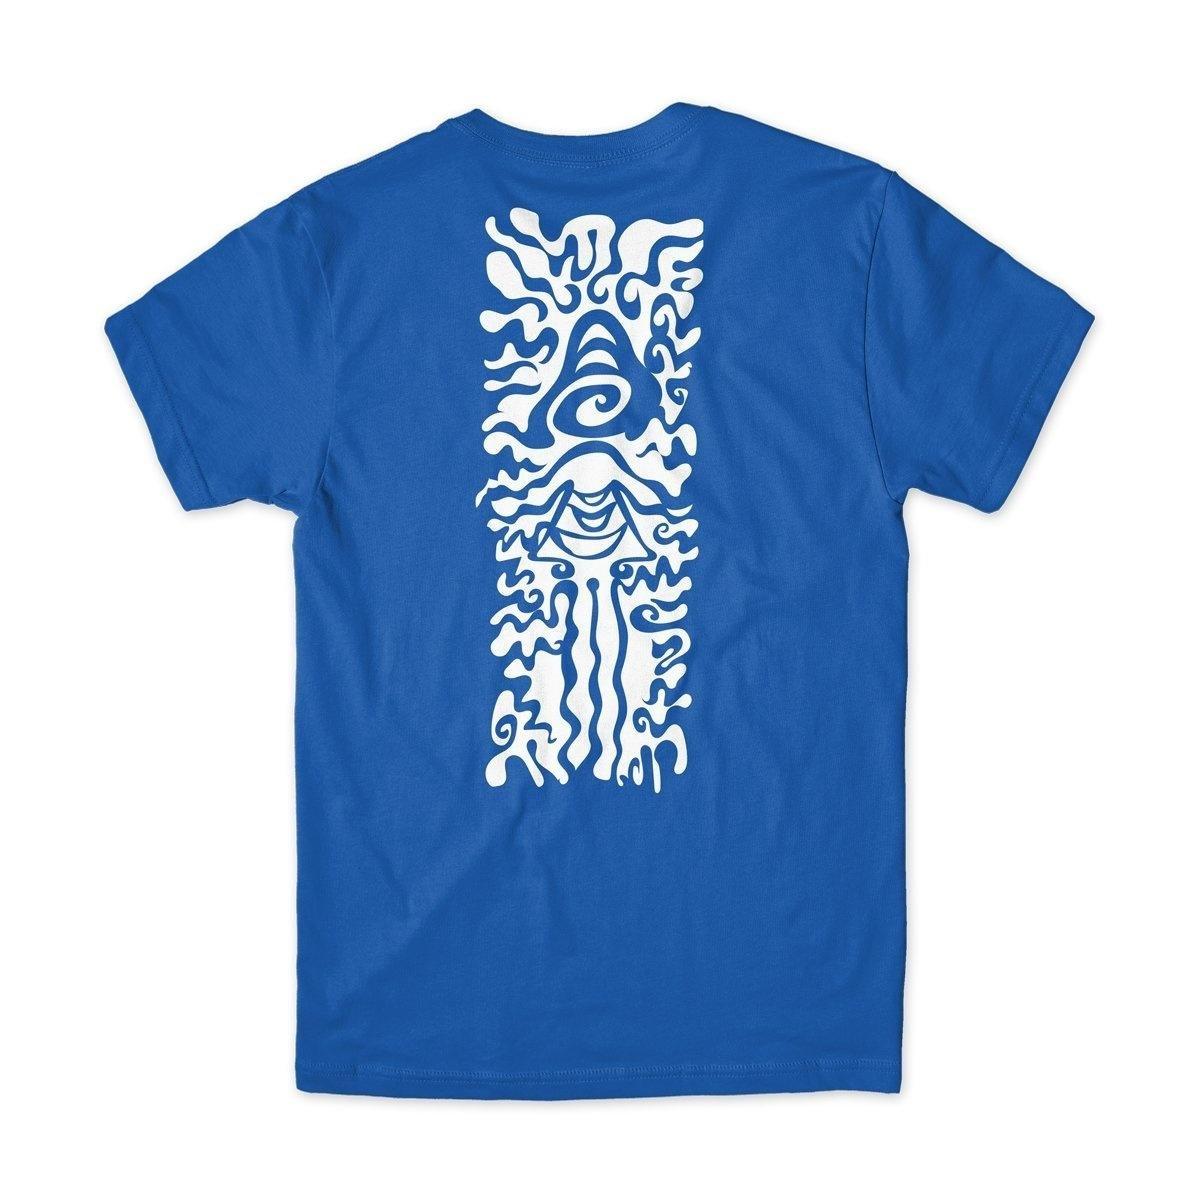 Girl Simon Bannerot Mystic s/s t-shirt Royal